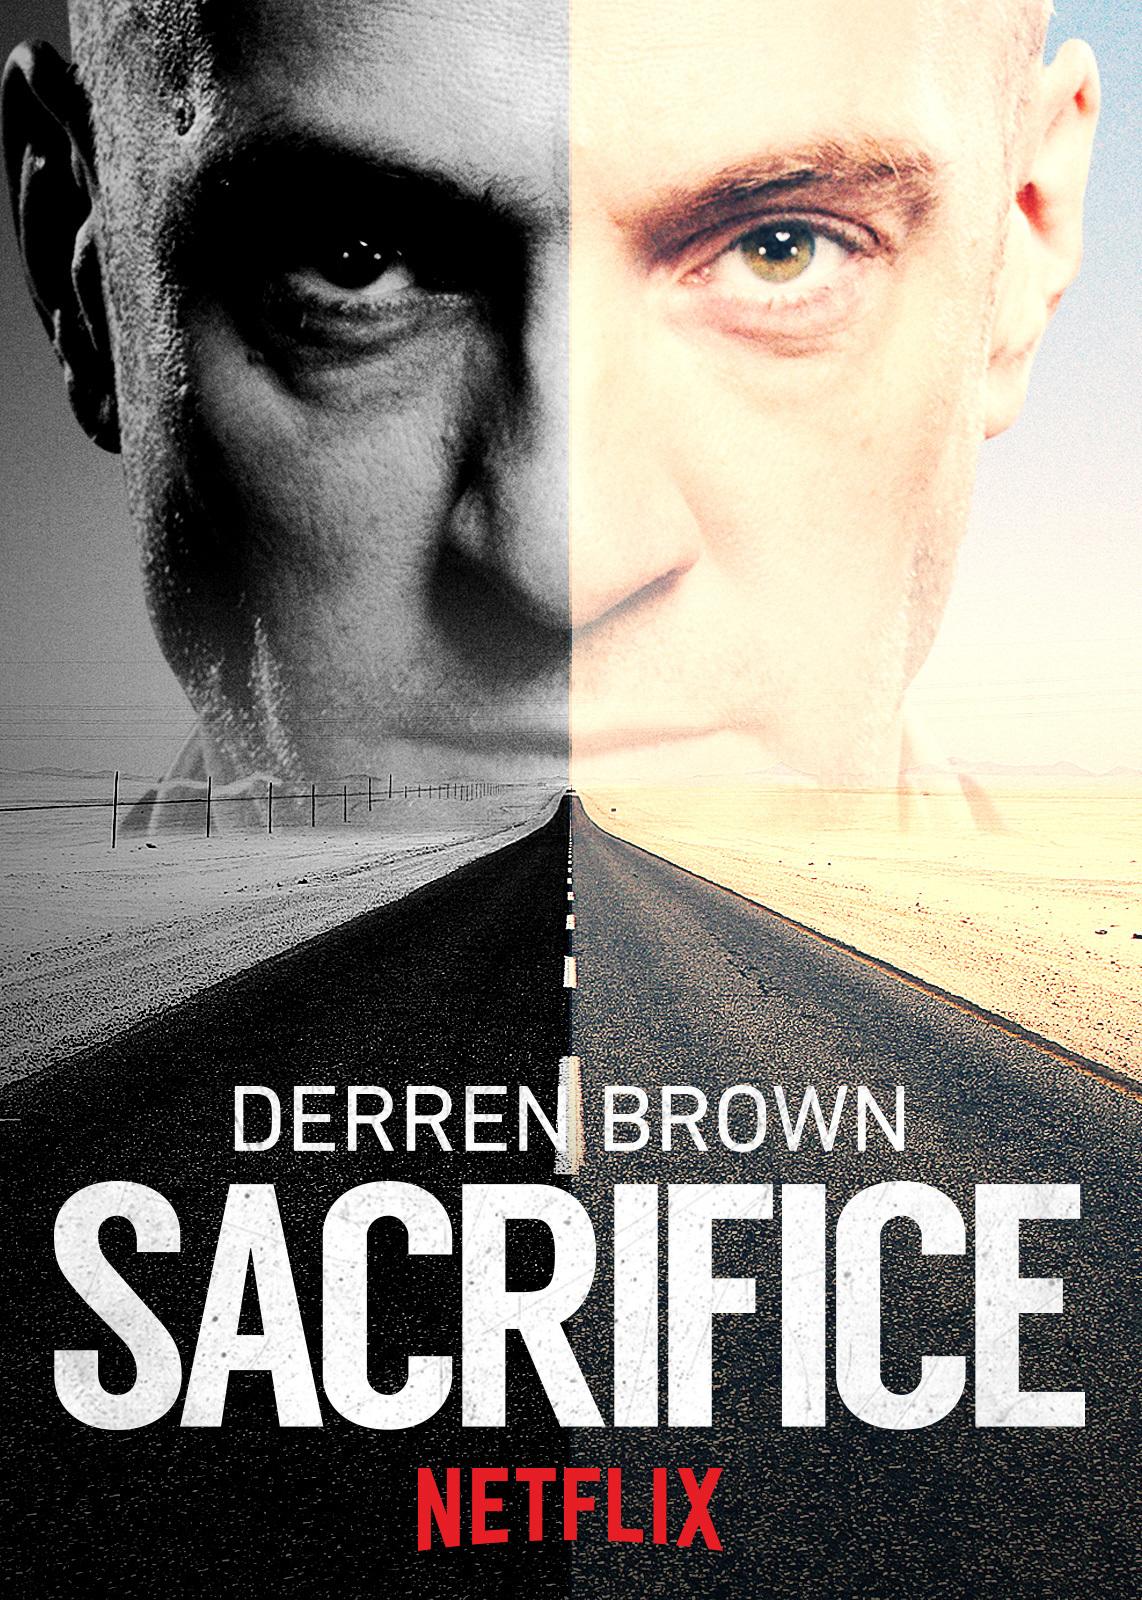 03_DerrenBrown_Sacrifice.jpg